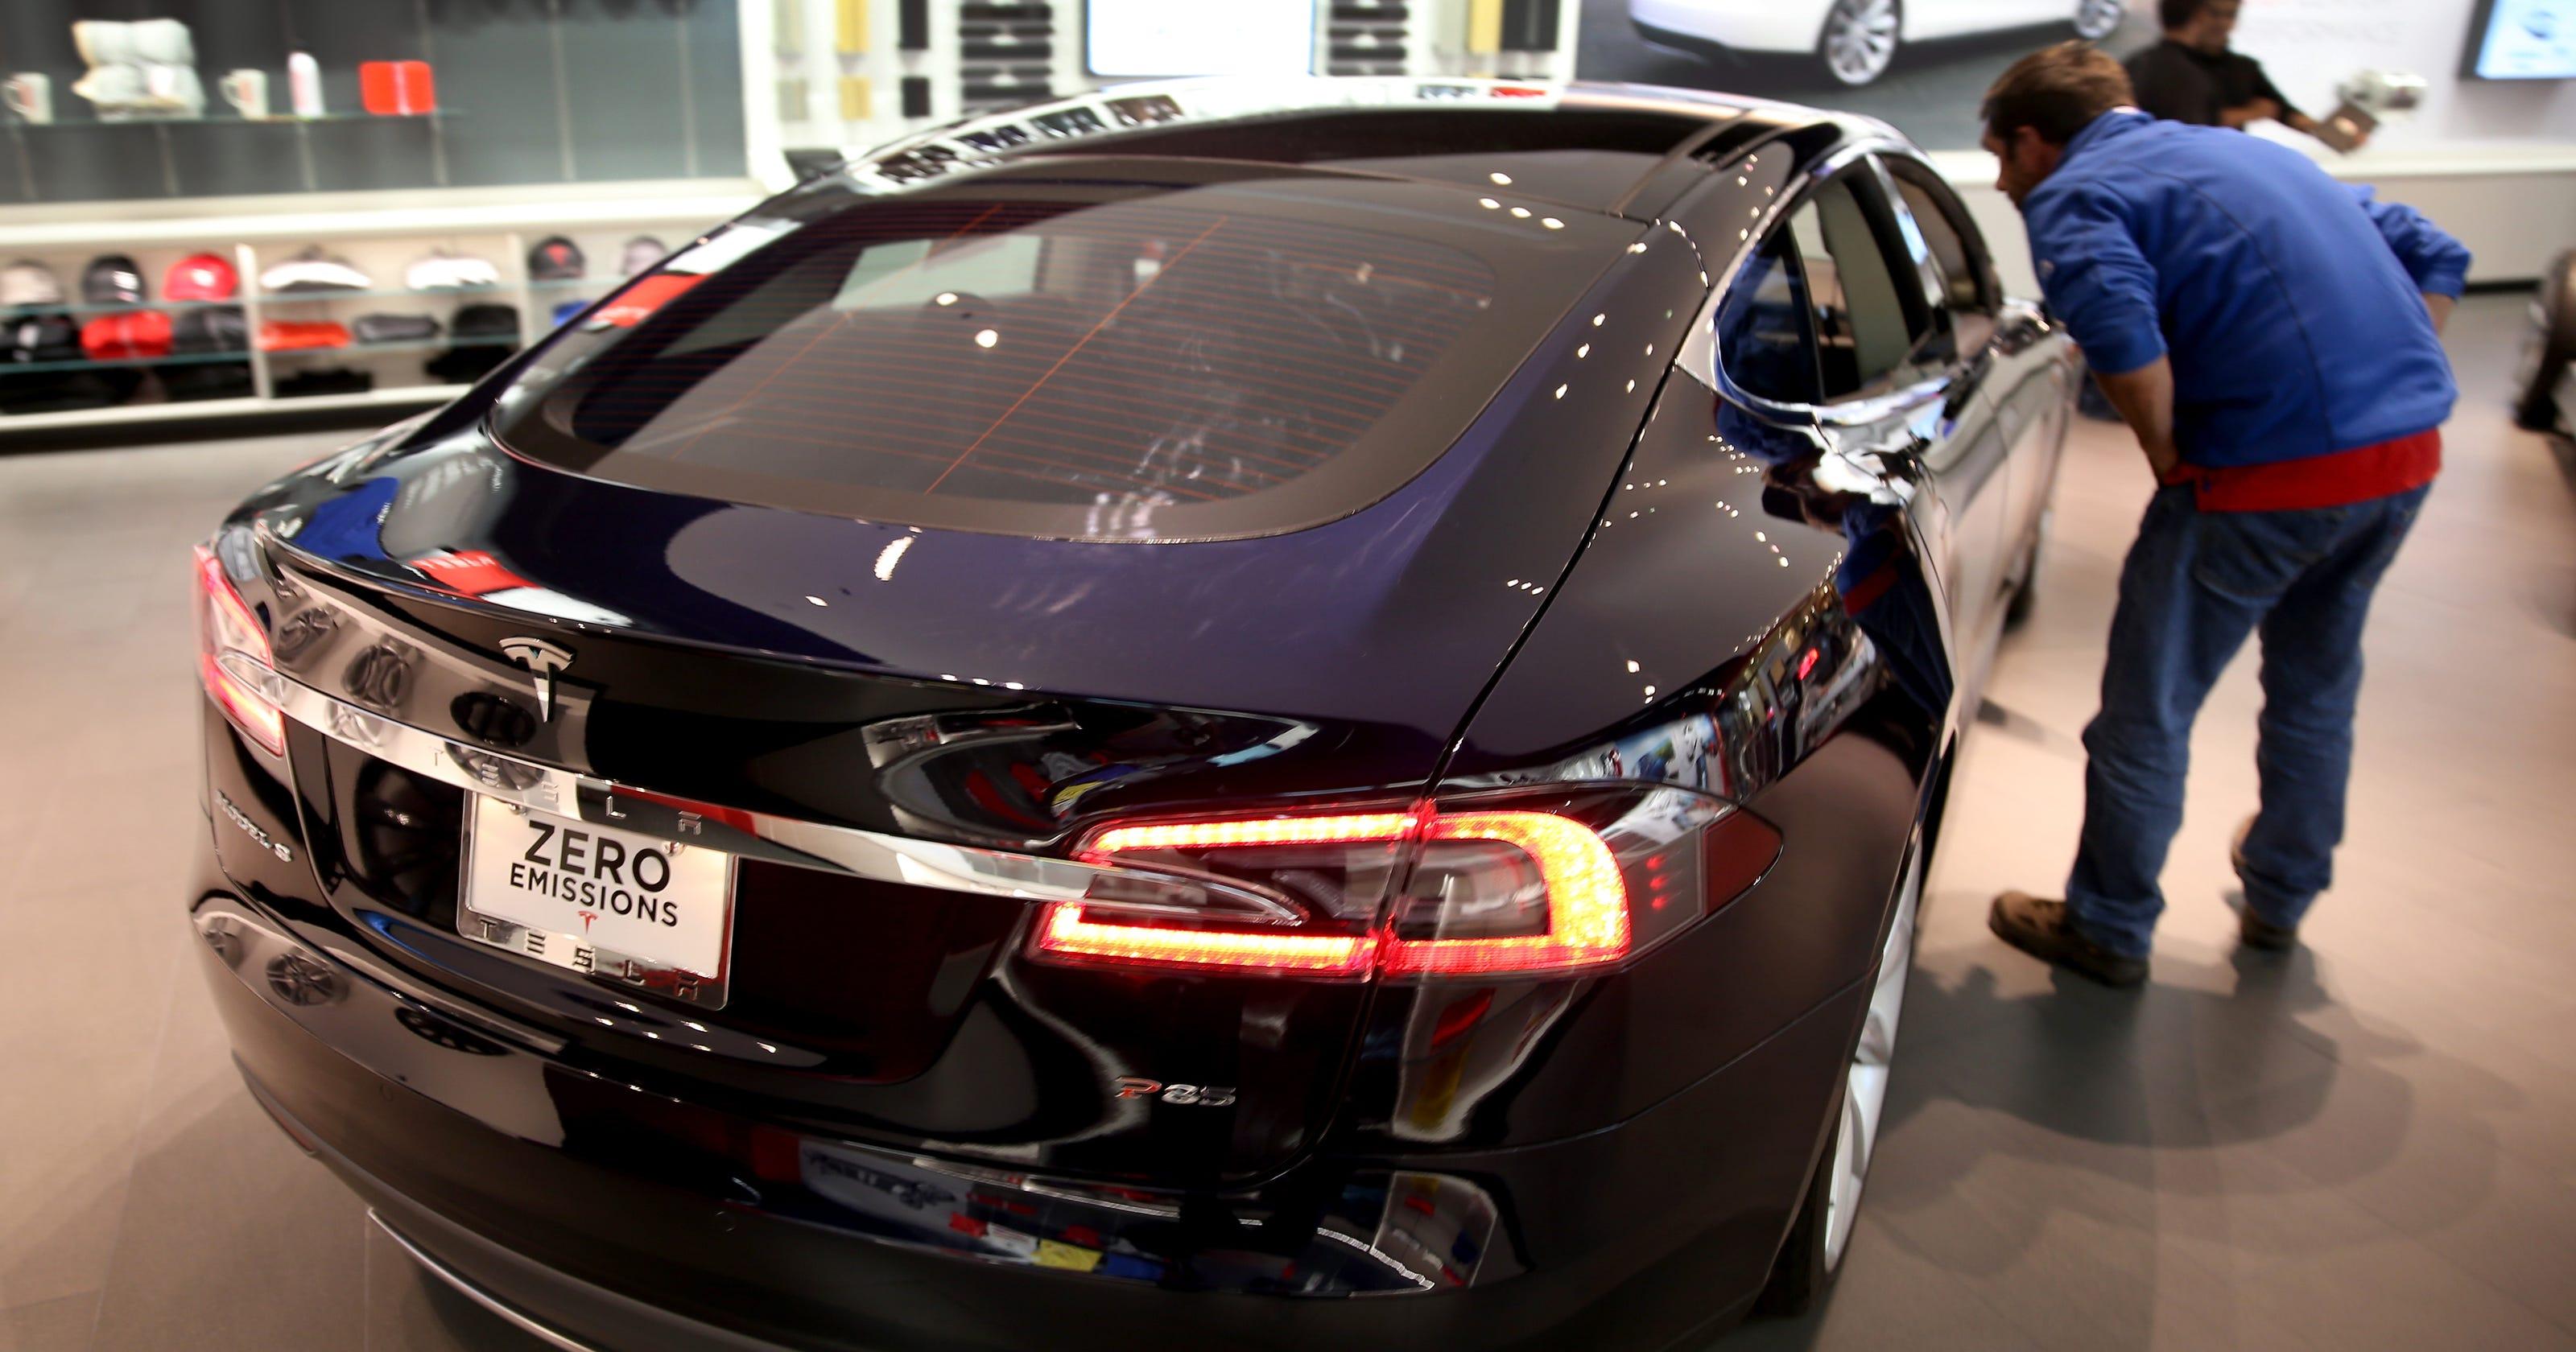 Tesla's wonder cars tripped up by dumb door handles